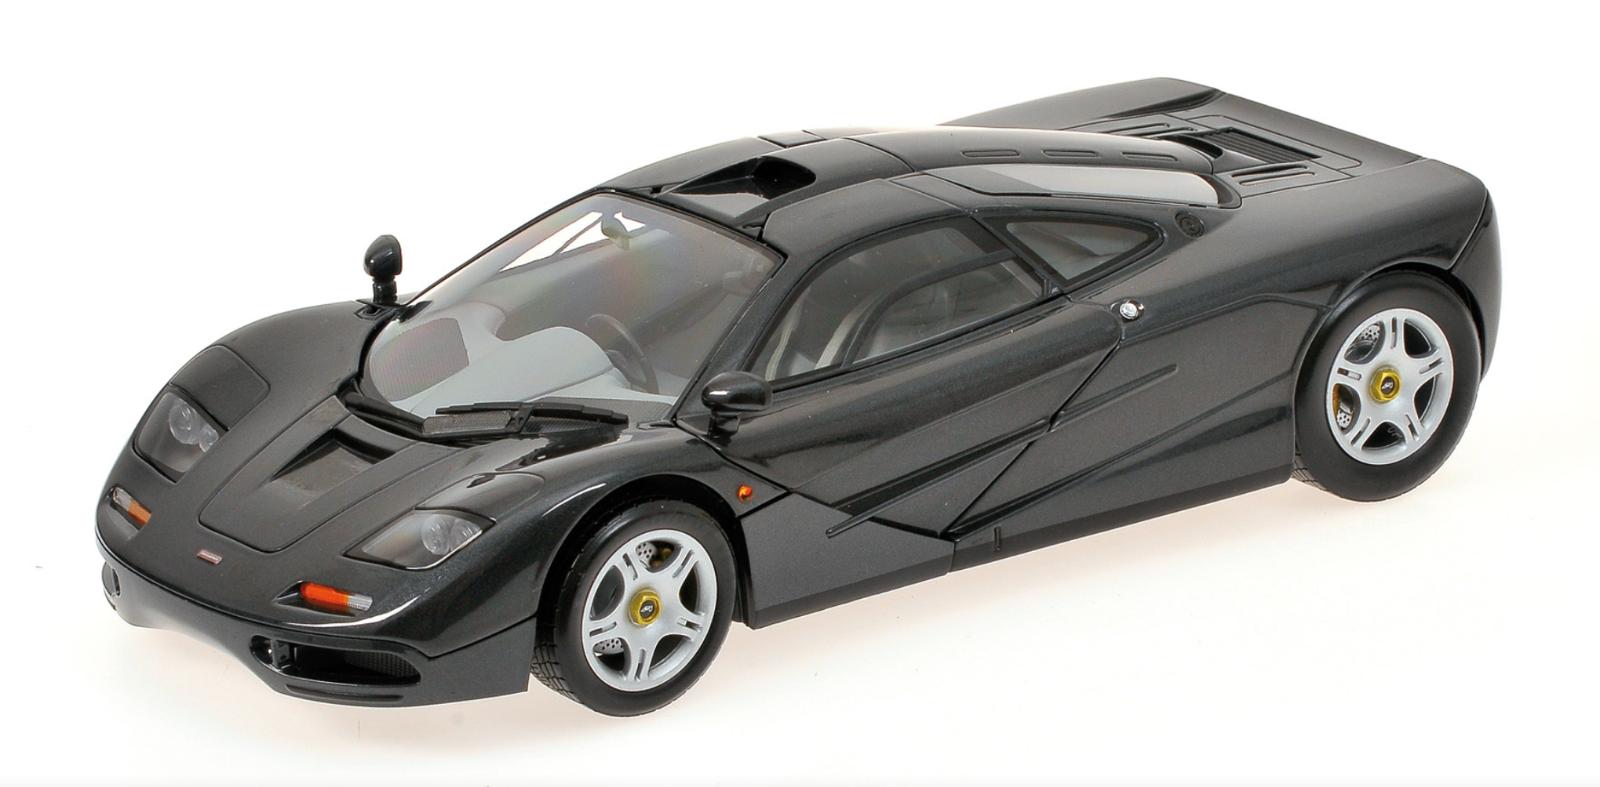 1 18 McLaren F1 1993 1 18 • Minichamps 530133420